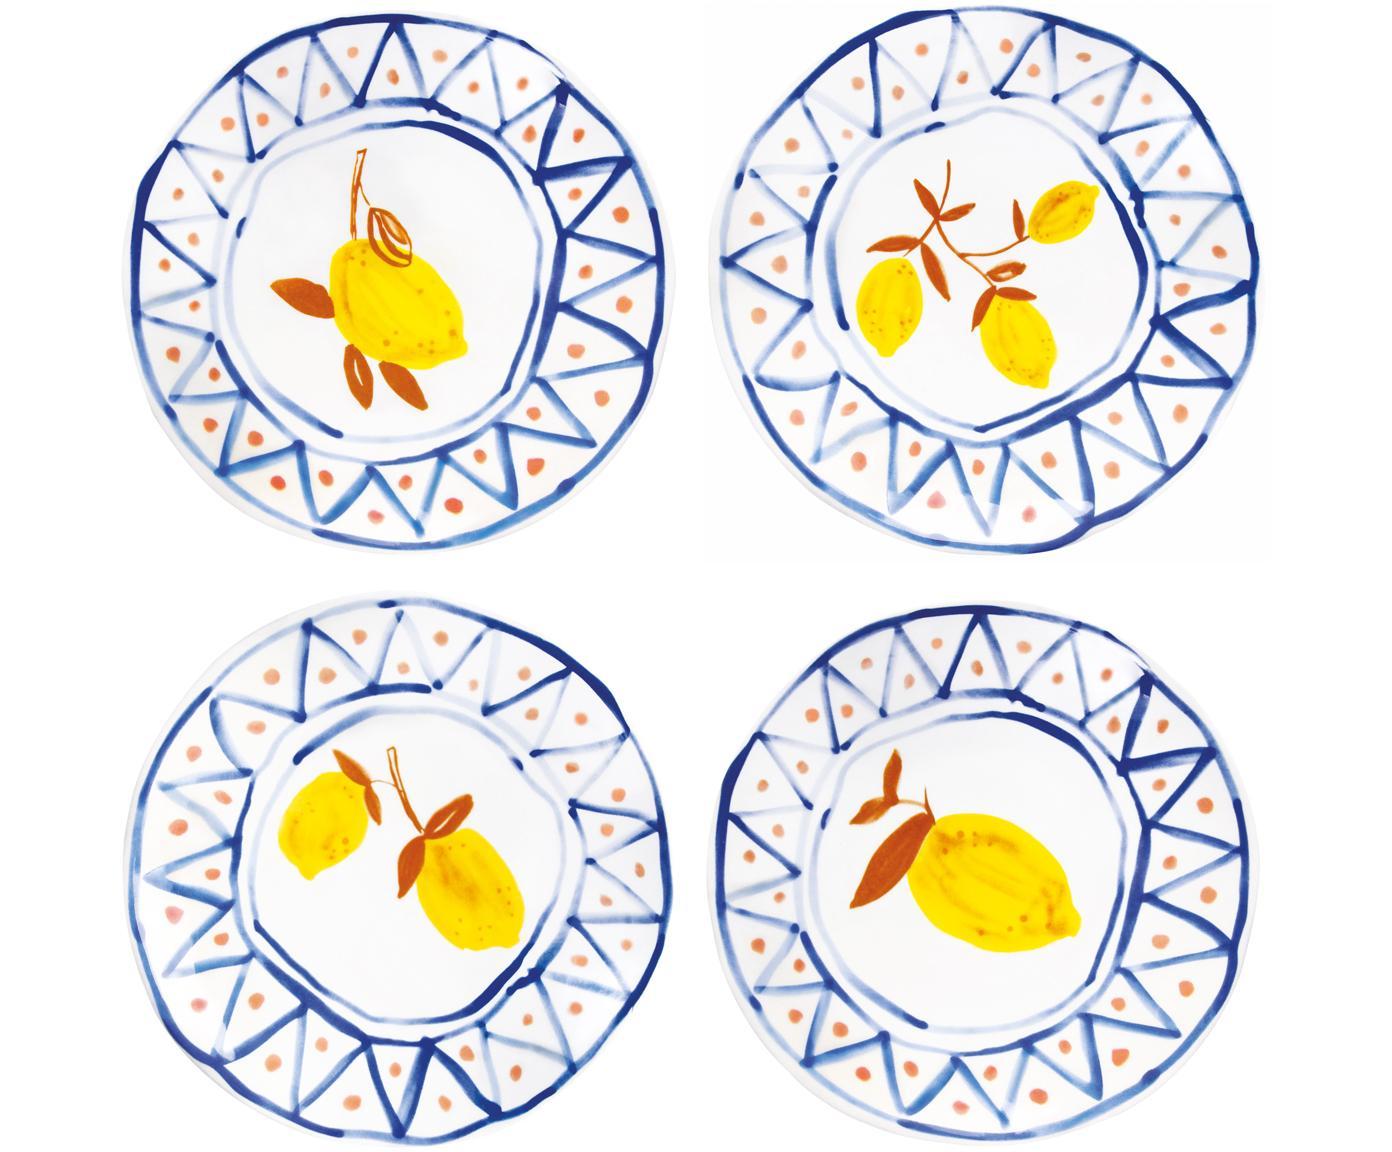 Broodbordenset Lemon Moroccan, 4-delig, Keramiek, Wit, blauw, oranje, geel, Ø 16 cm